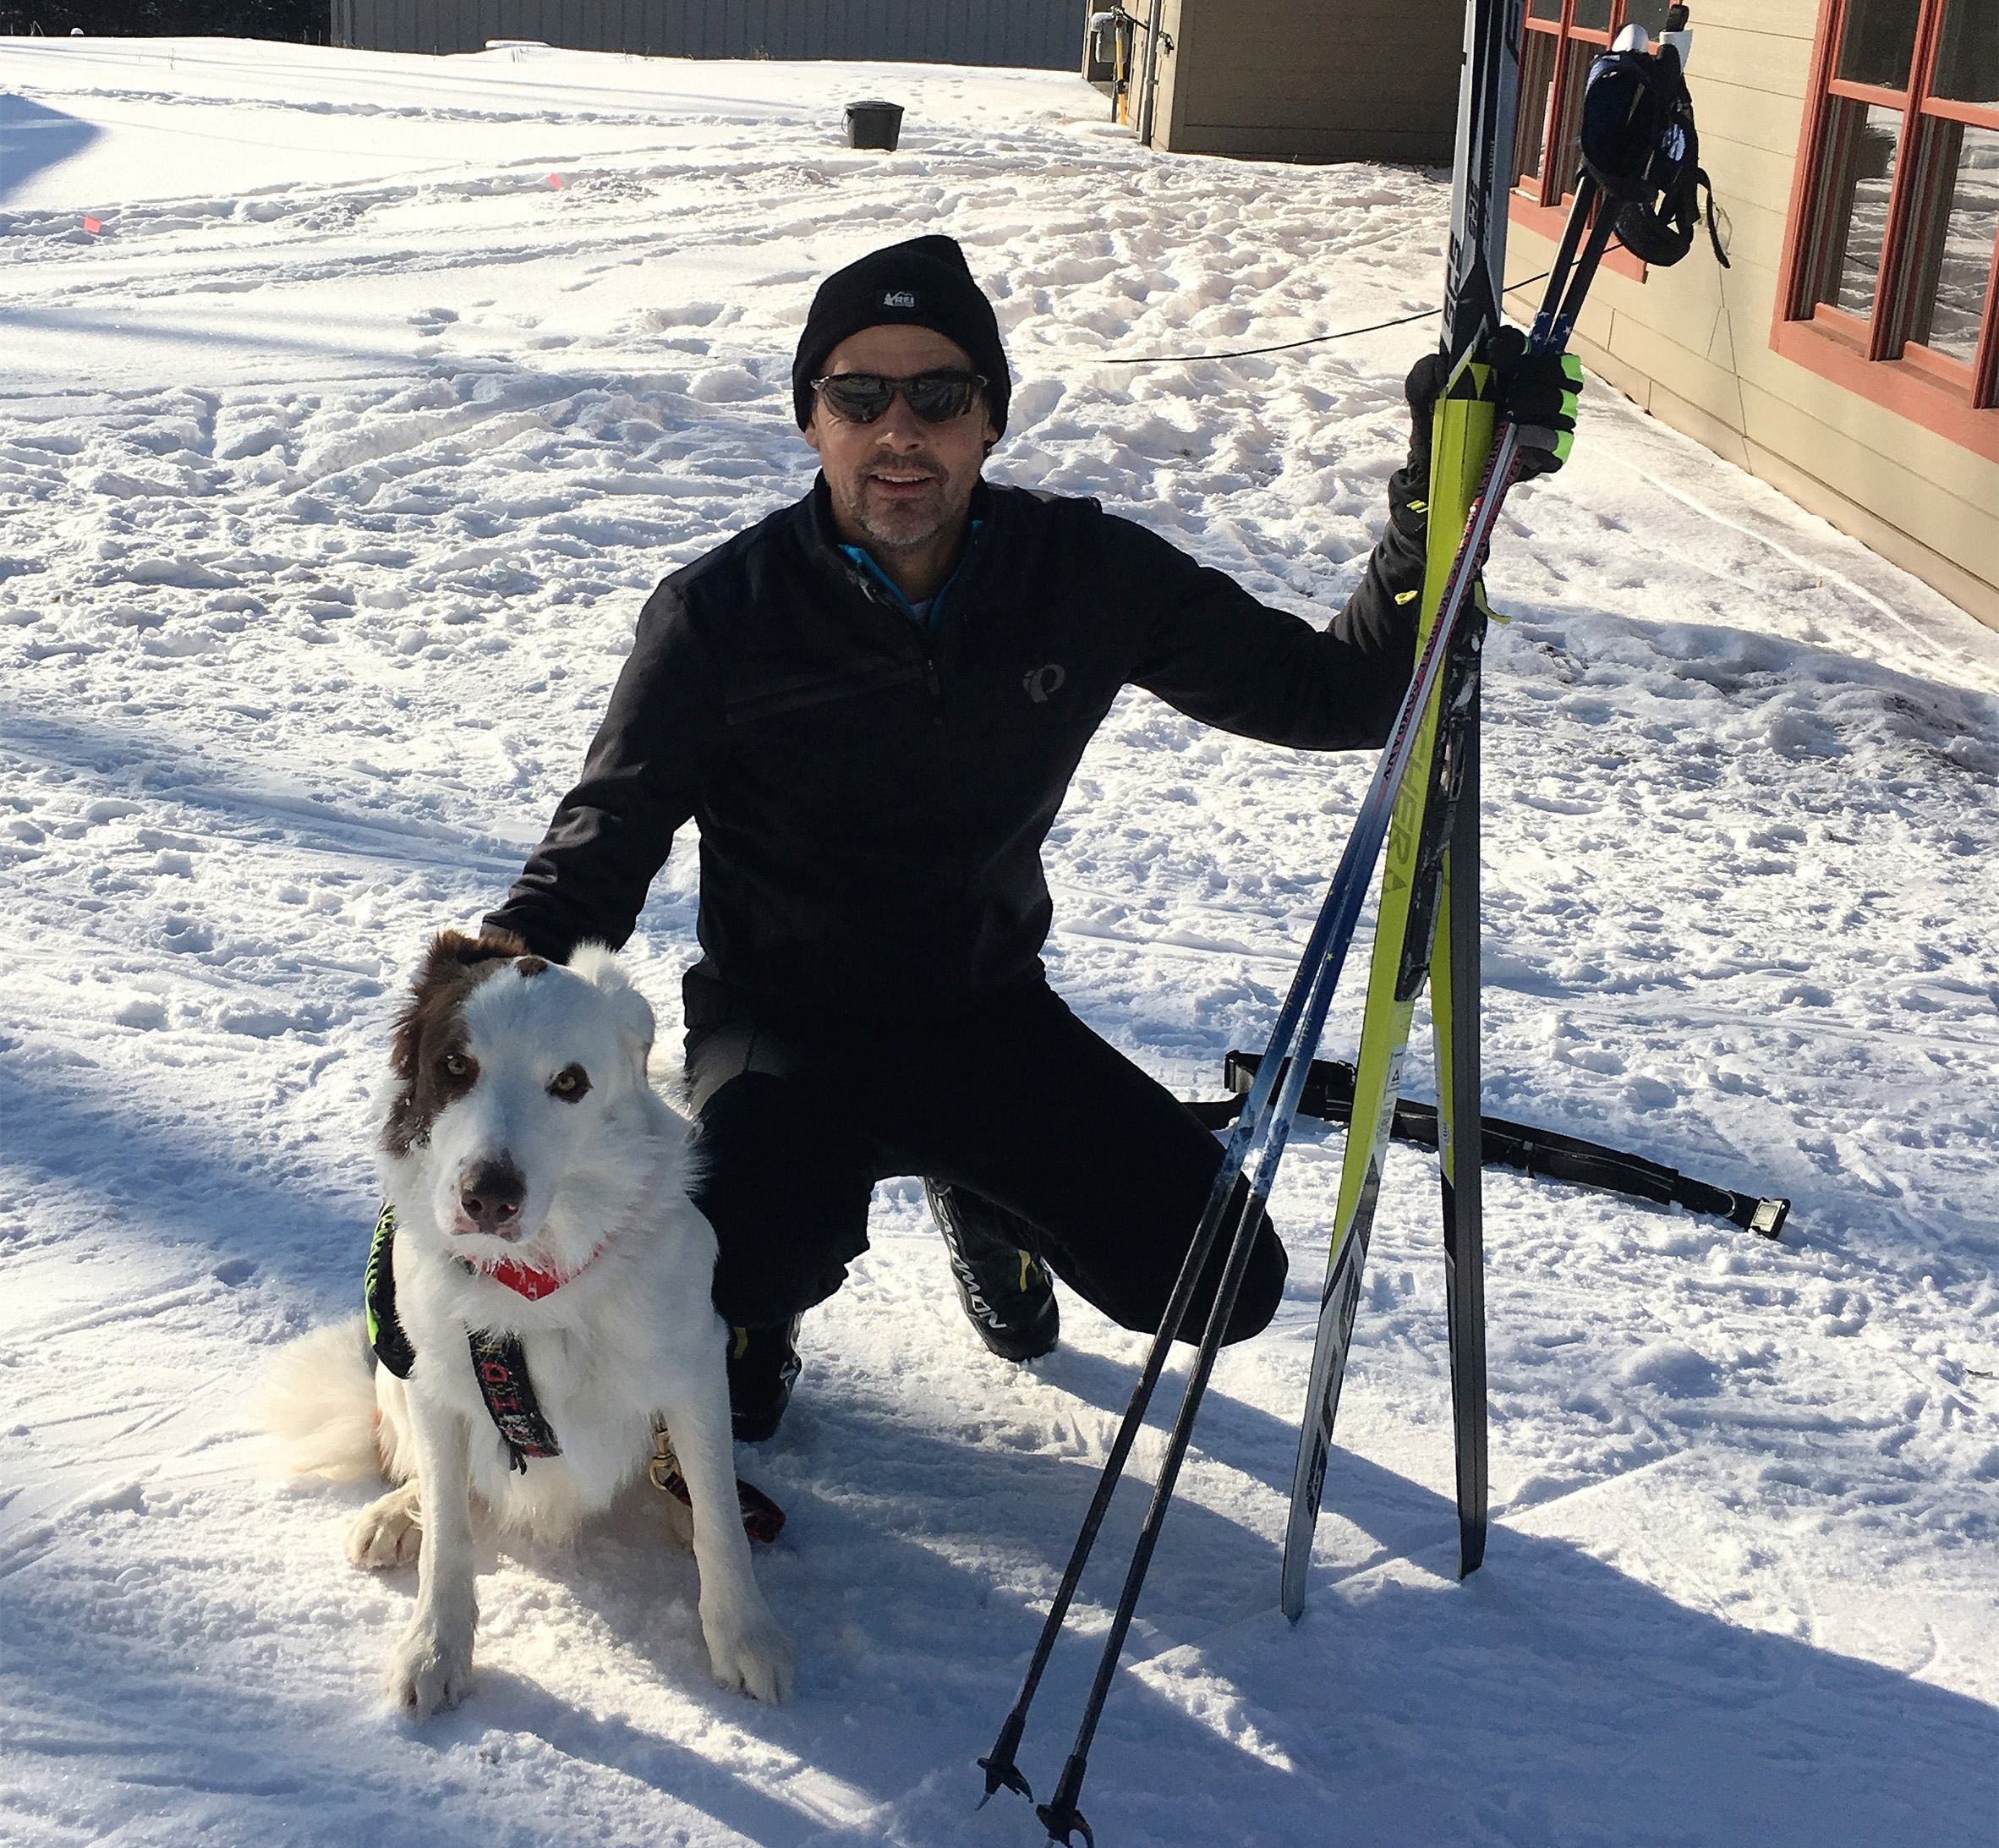 Robert enjoys skijoring with his dog at the WinMan Trails, Manitowish Waters. Kim Johnson photo